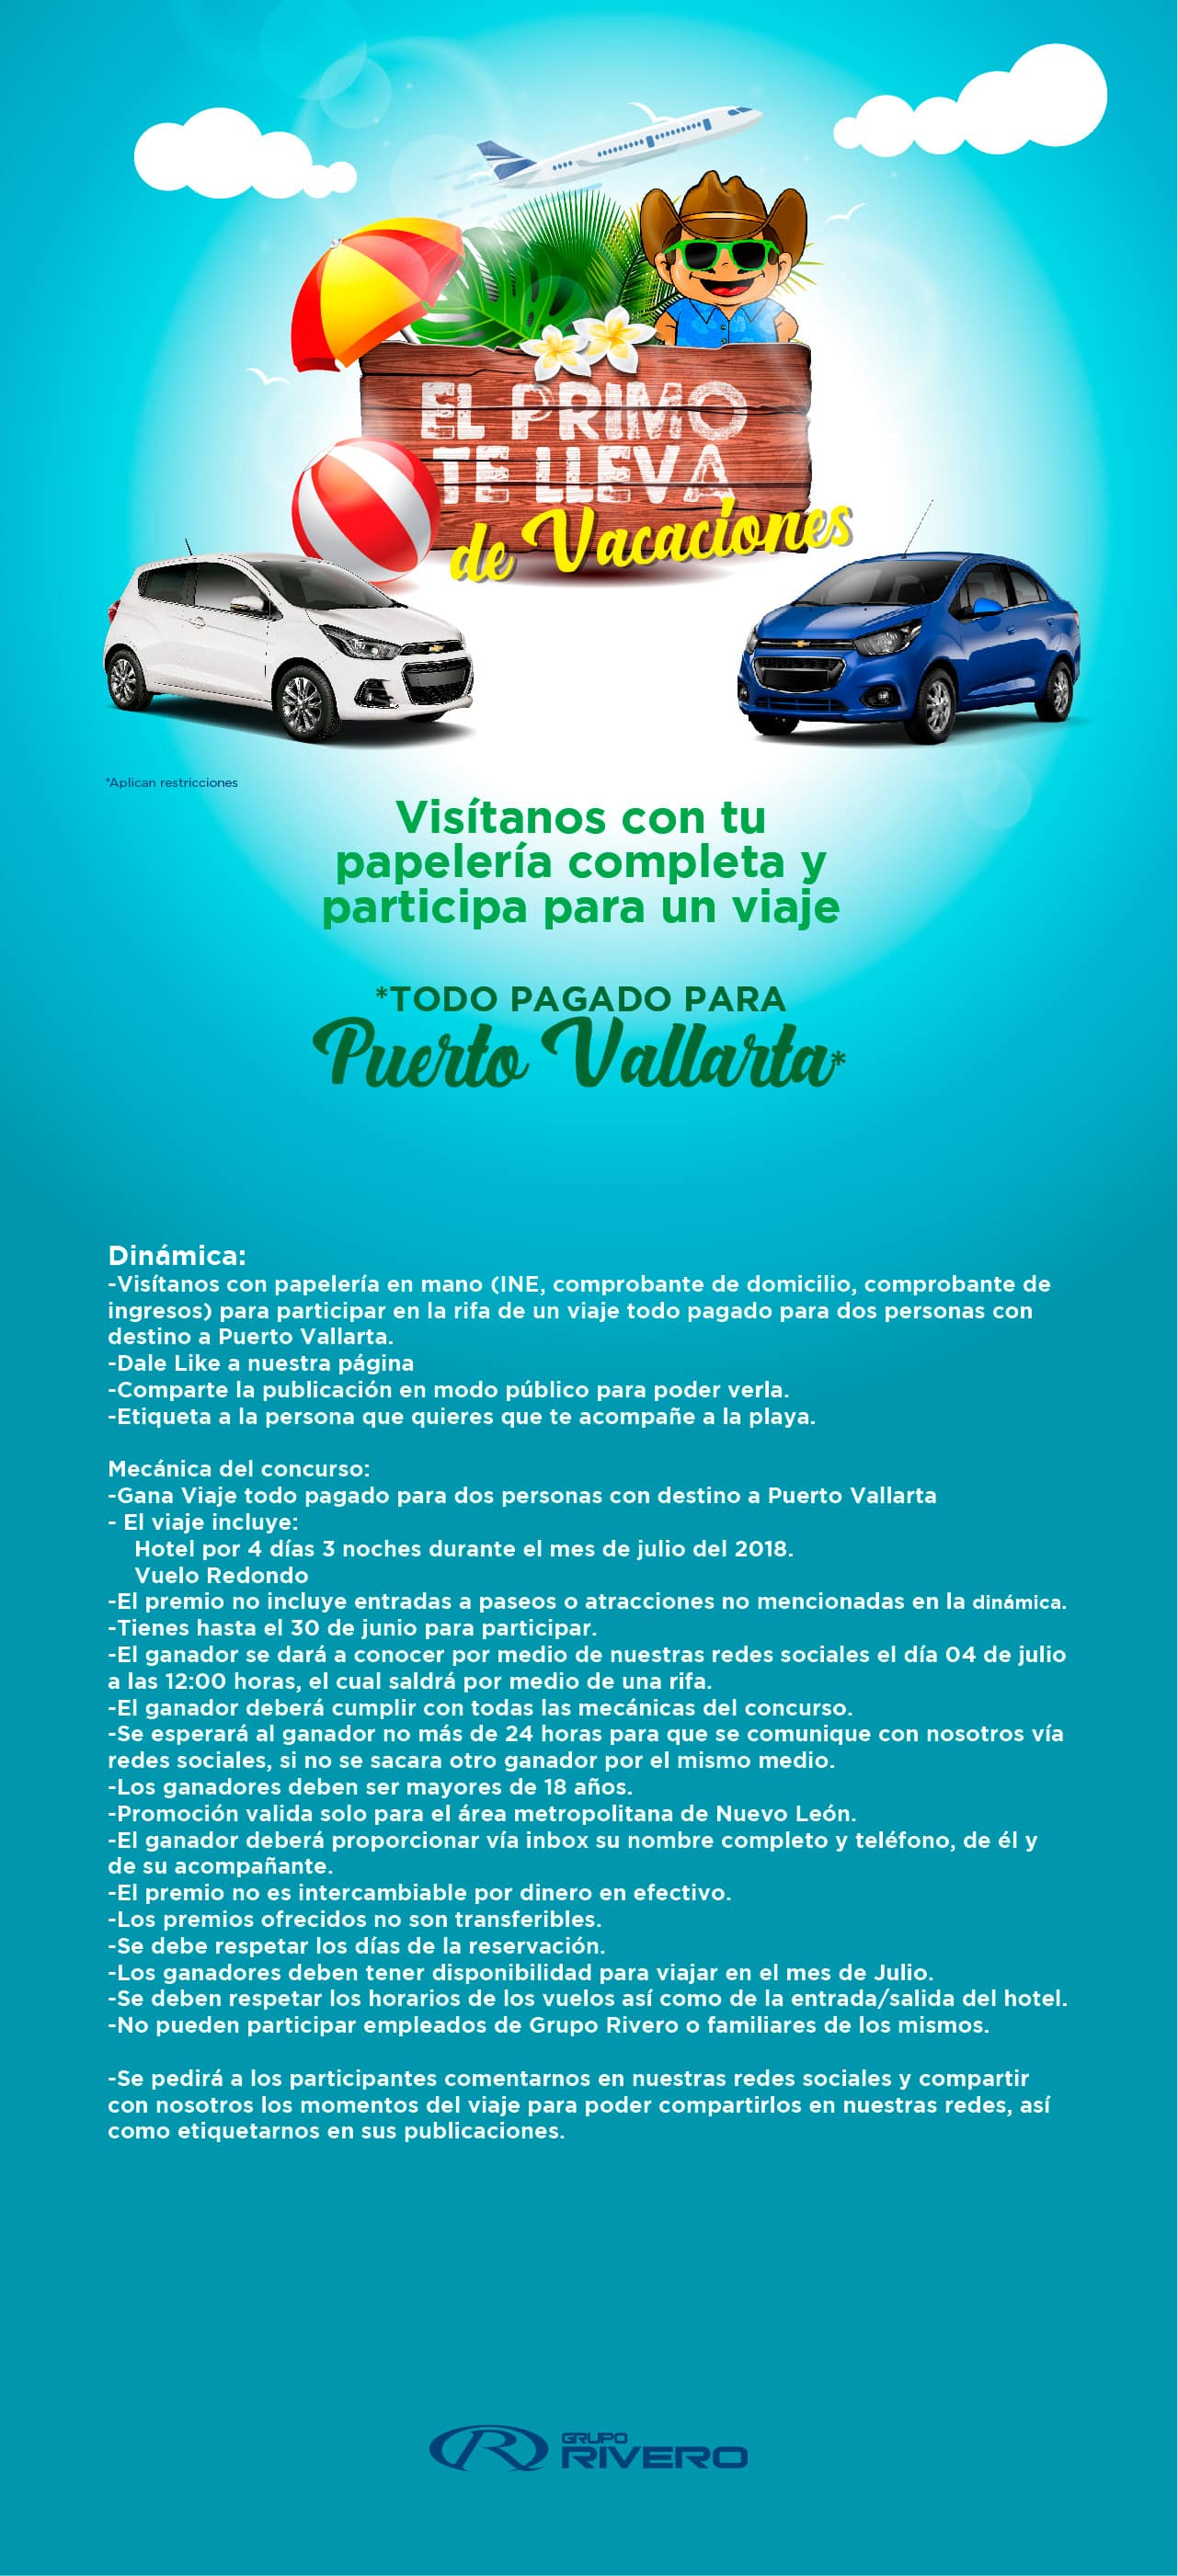 Mail Marketing Humberto Lobo